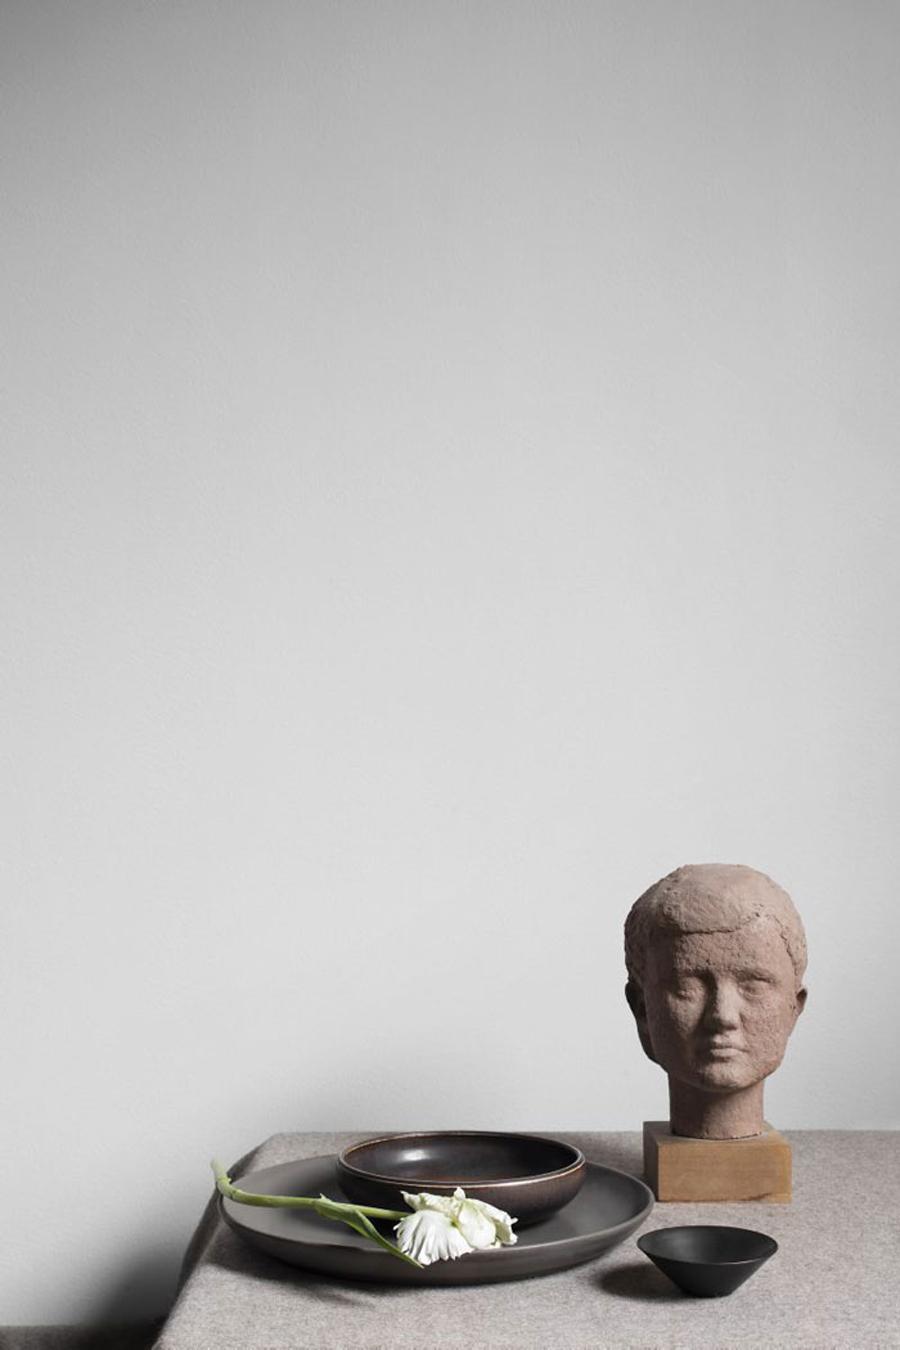 claes-juhlin-minimalism-art-home-5